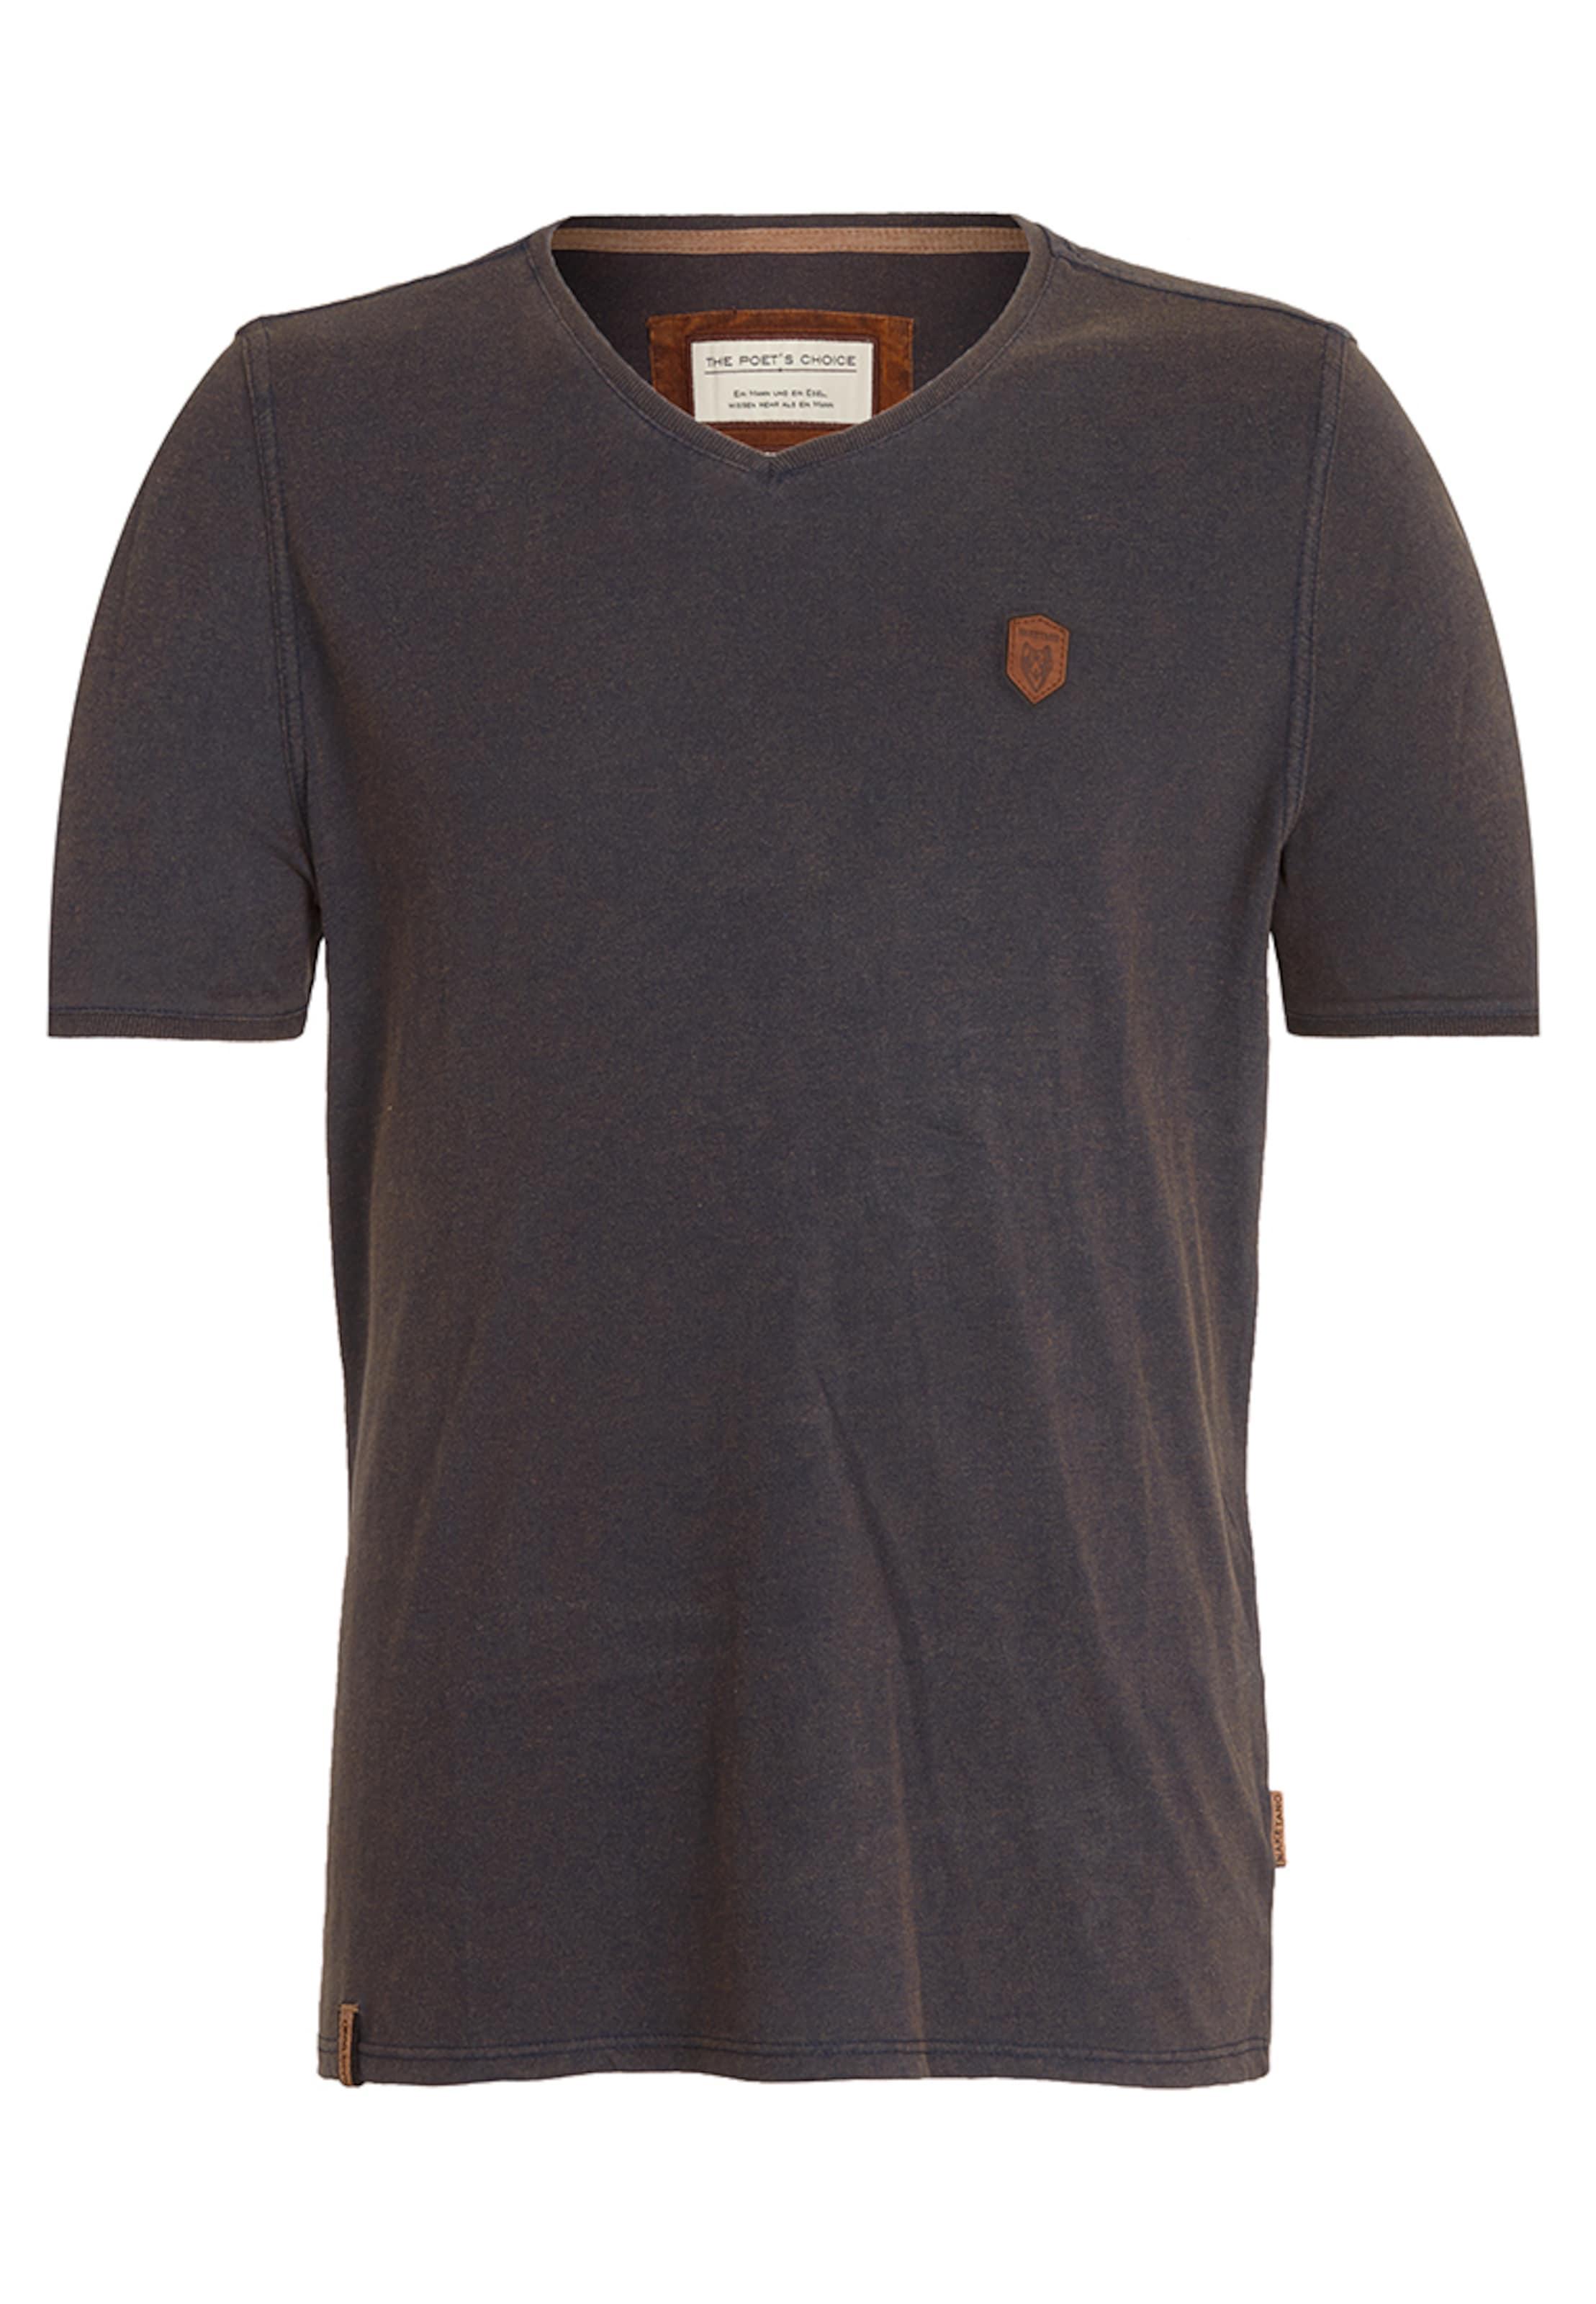 T Greige Naketano shirt 'schimpanski' En qSc5Aj34RL